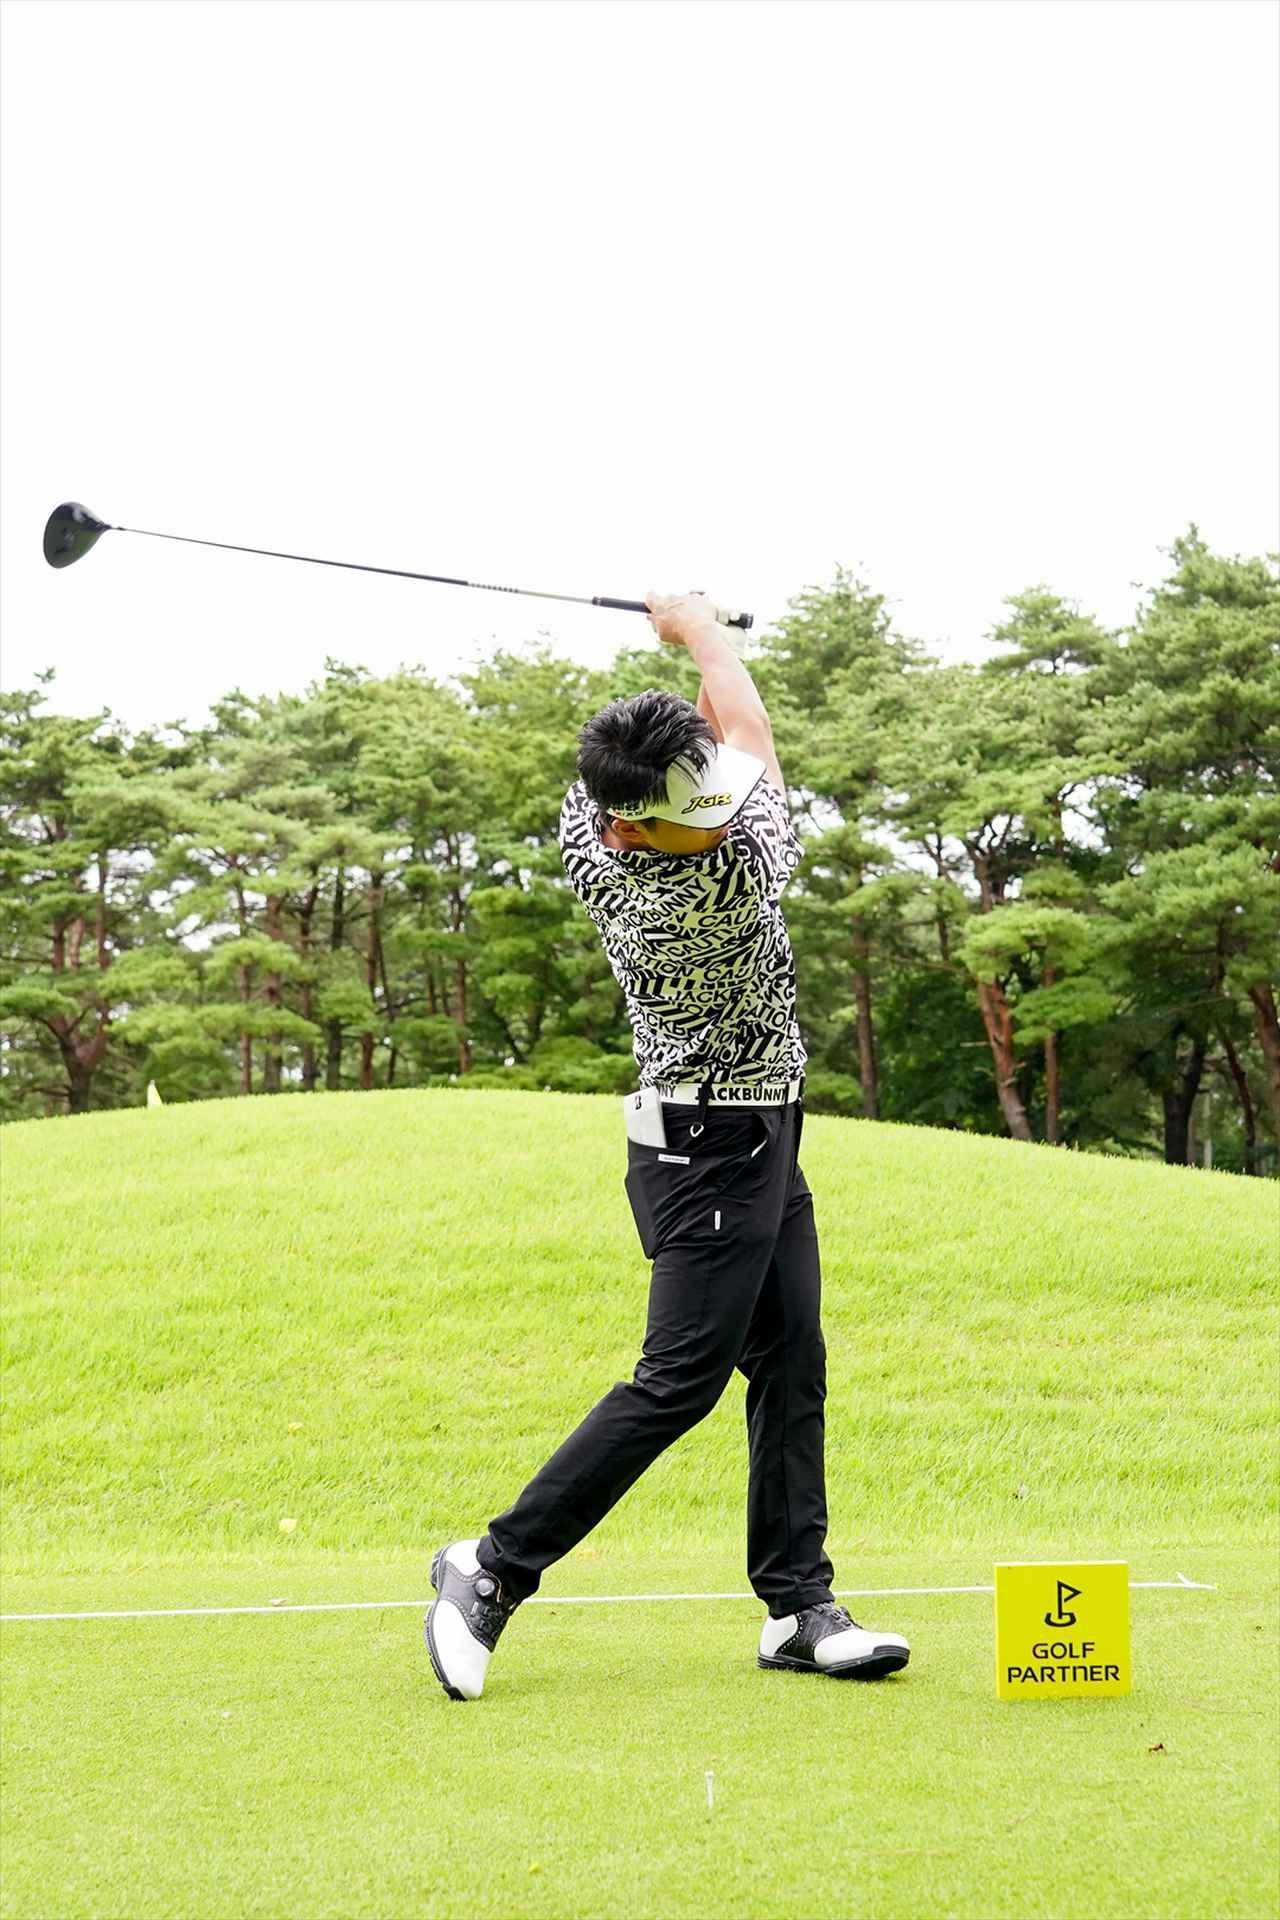 Images : 11番目の画像 - 関藤直煕 ドライバー正面連続写真 - みんなのゴルフダイジェスト